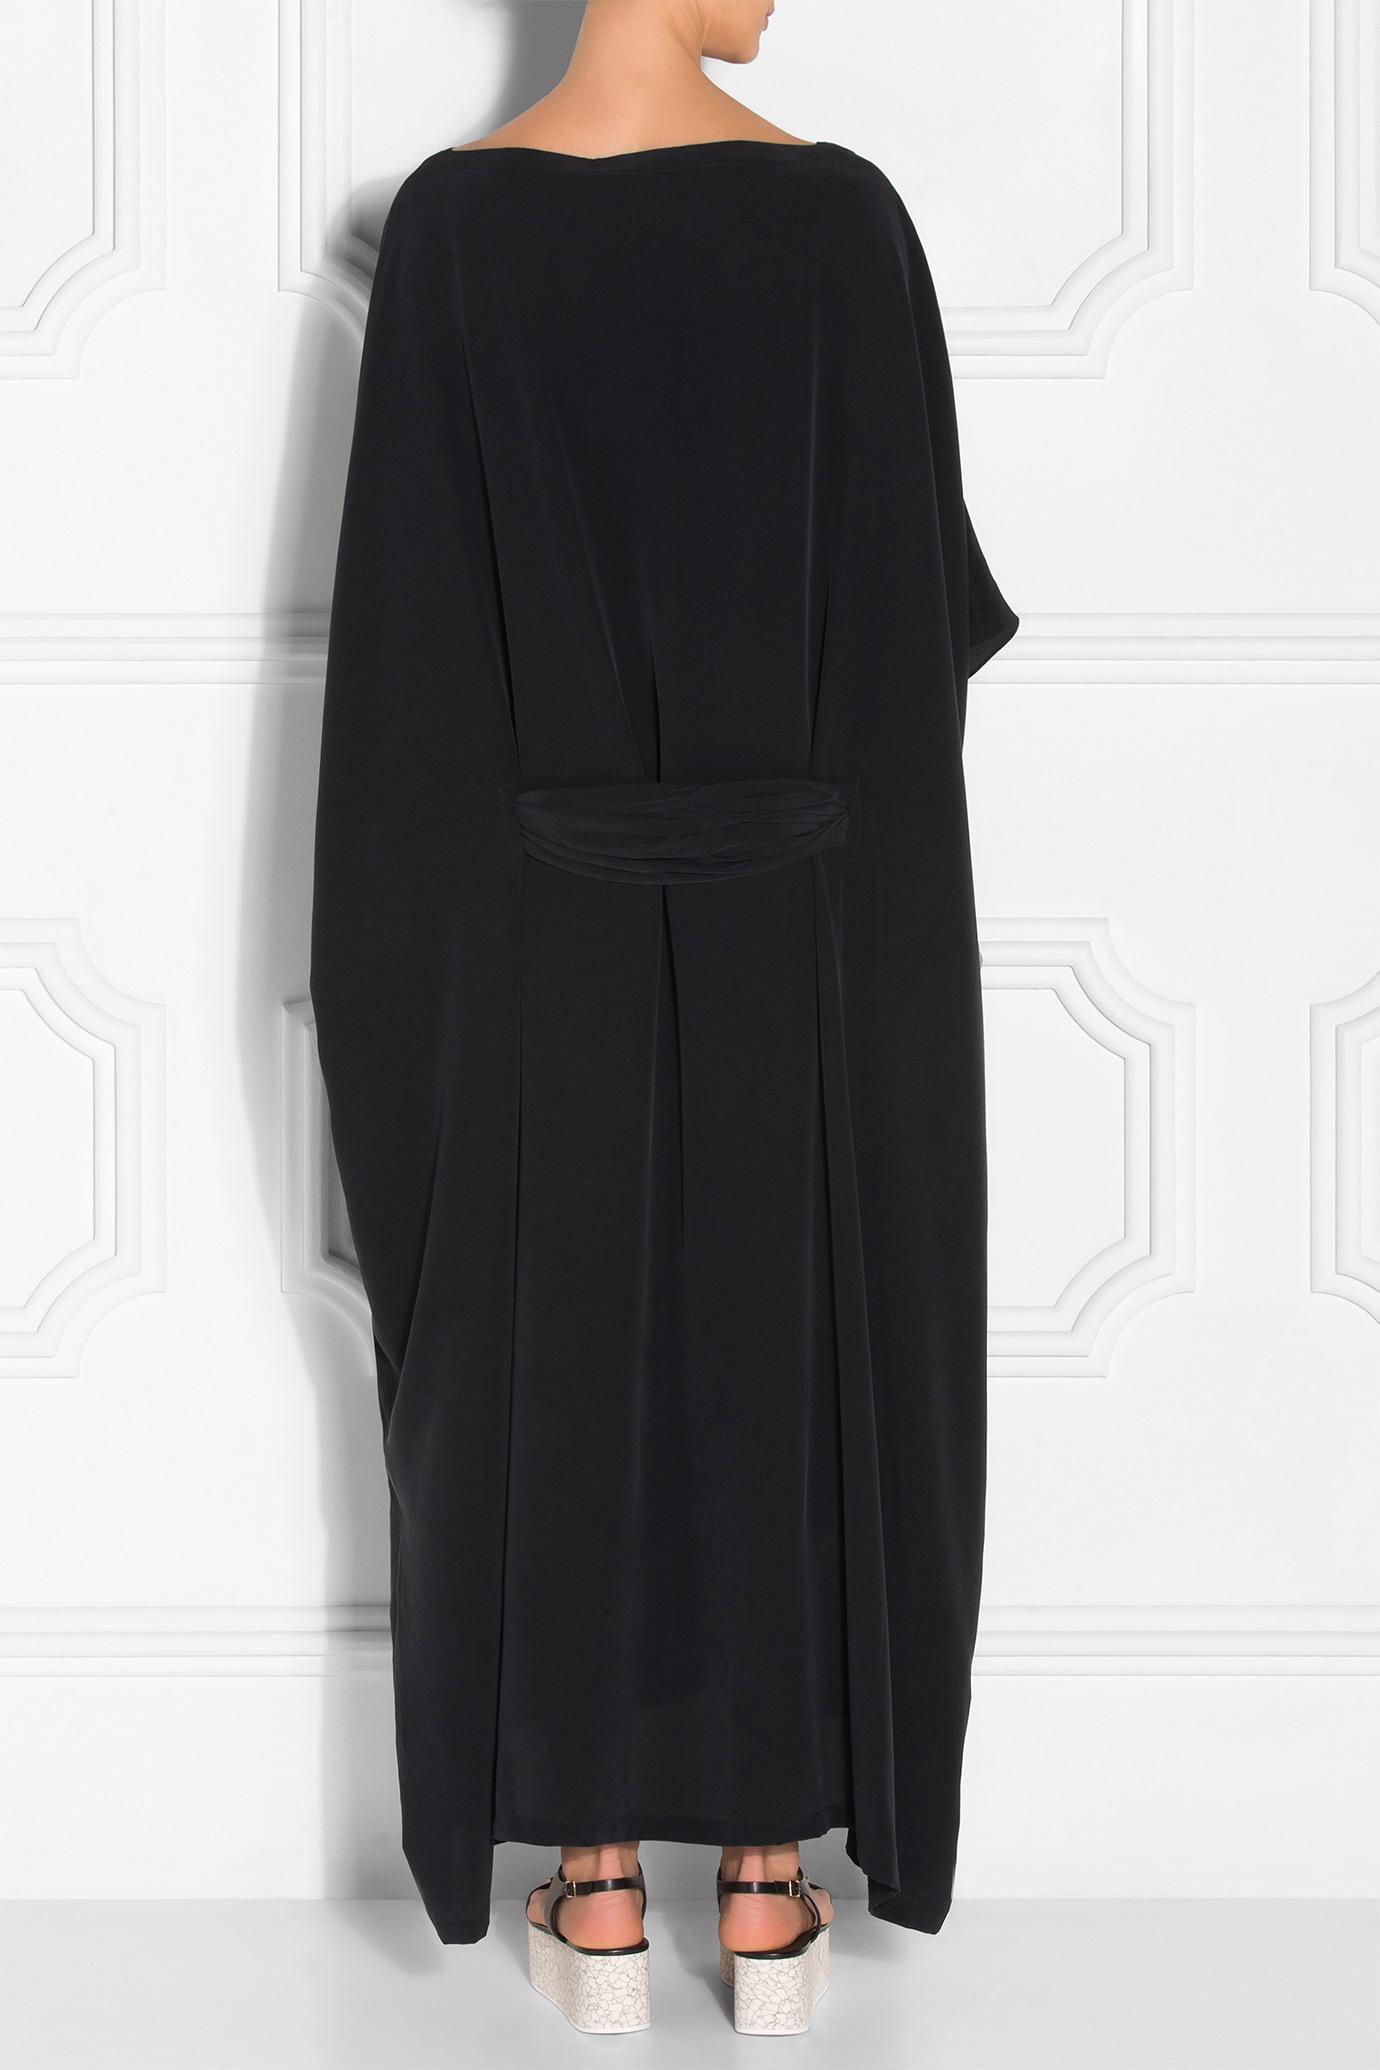 Rodebjer Aura Maxi Kaftan Dress In Black Lyst